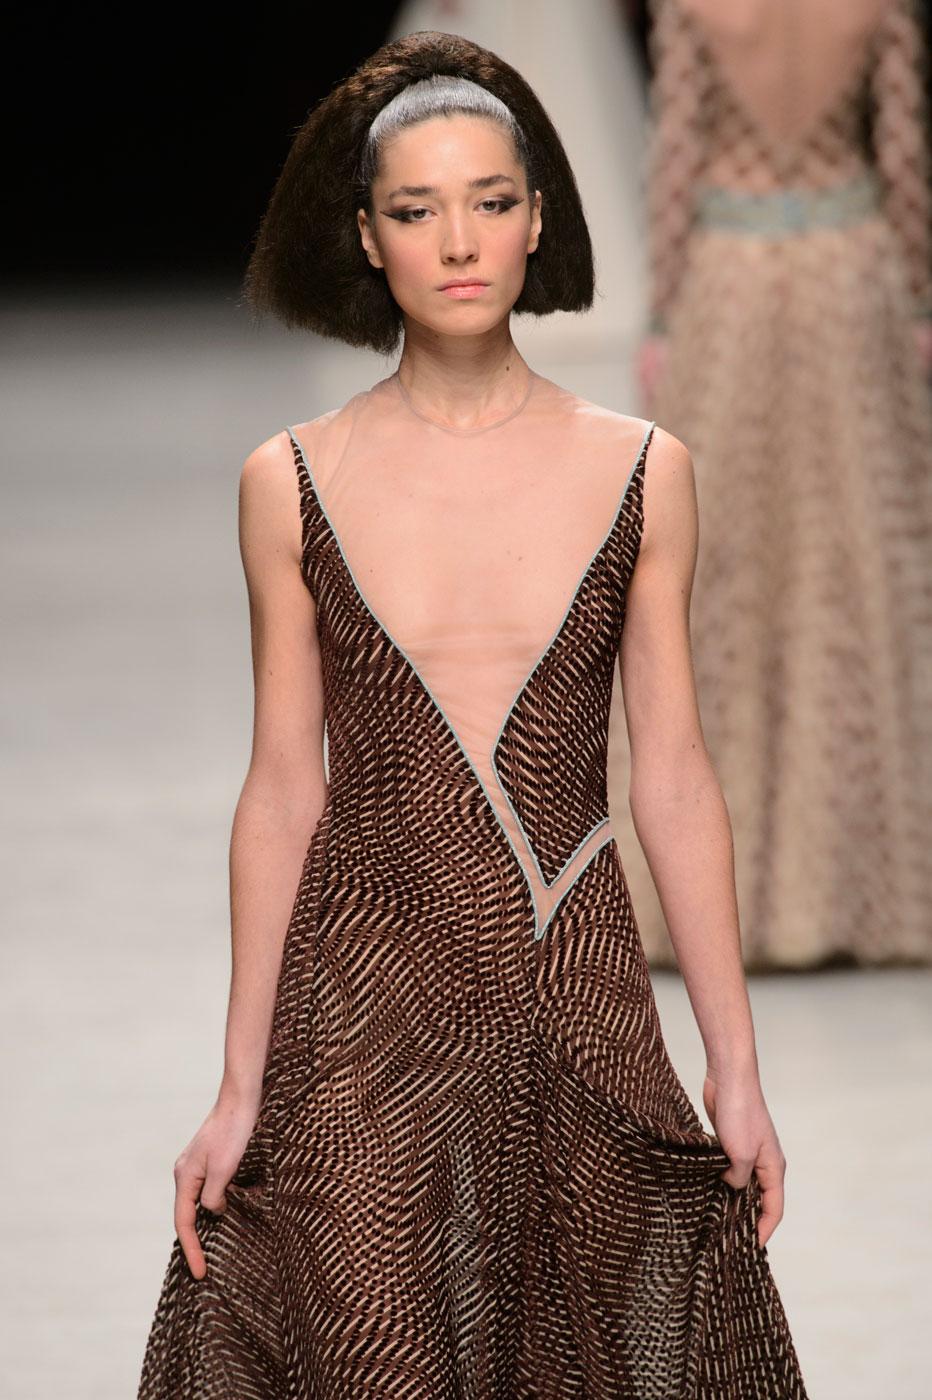 Julien-Fournie-Prive-fashion-runway-show-haute-couture-paris-spring-2015-the-impression-41